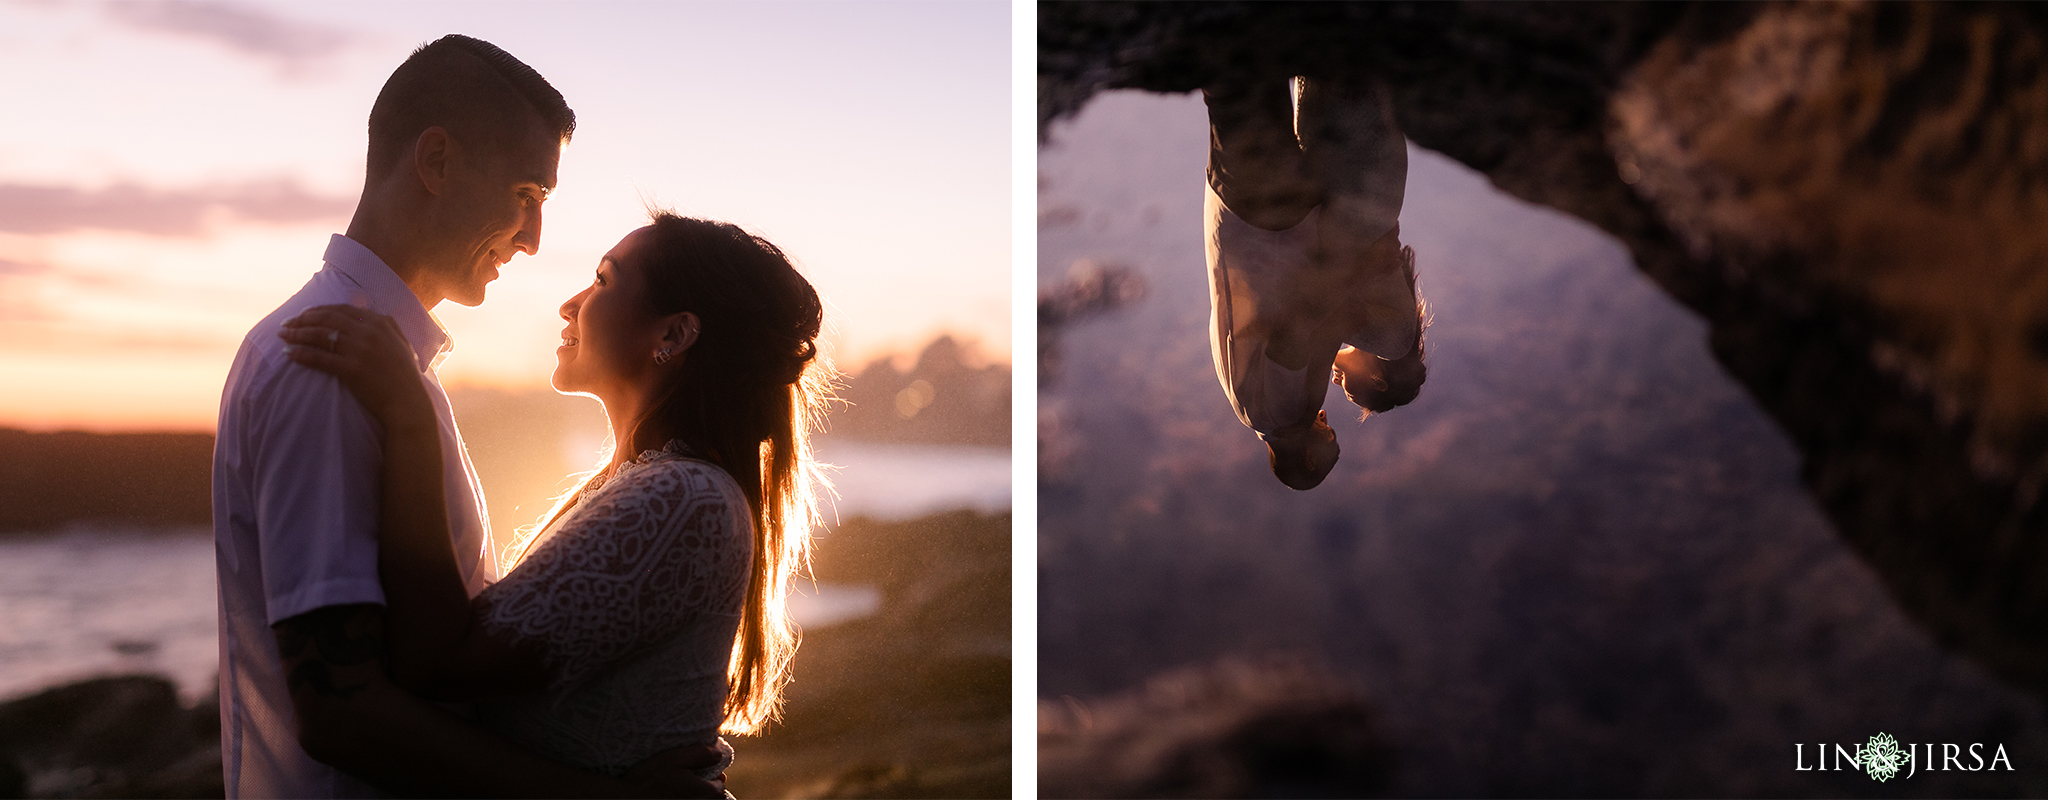 23 Heisler Beach Orange County Engagement Photography